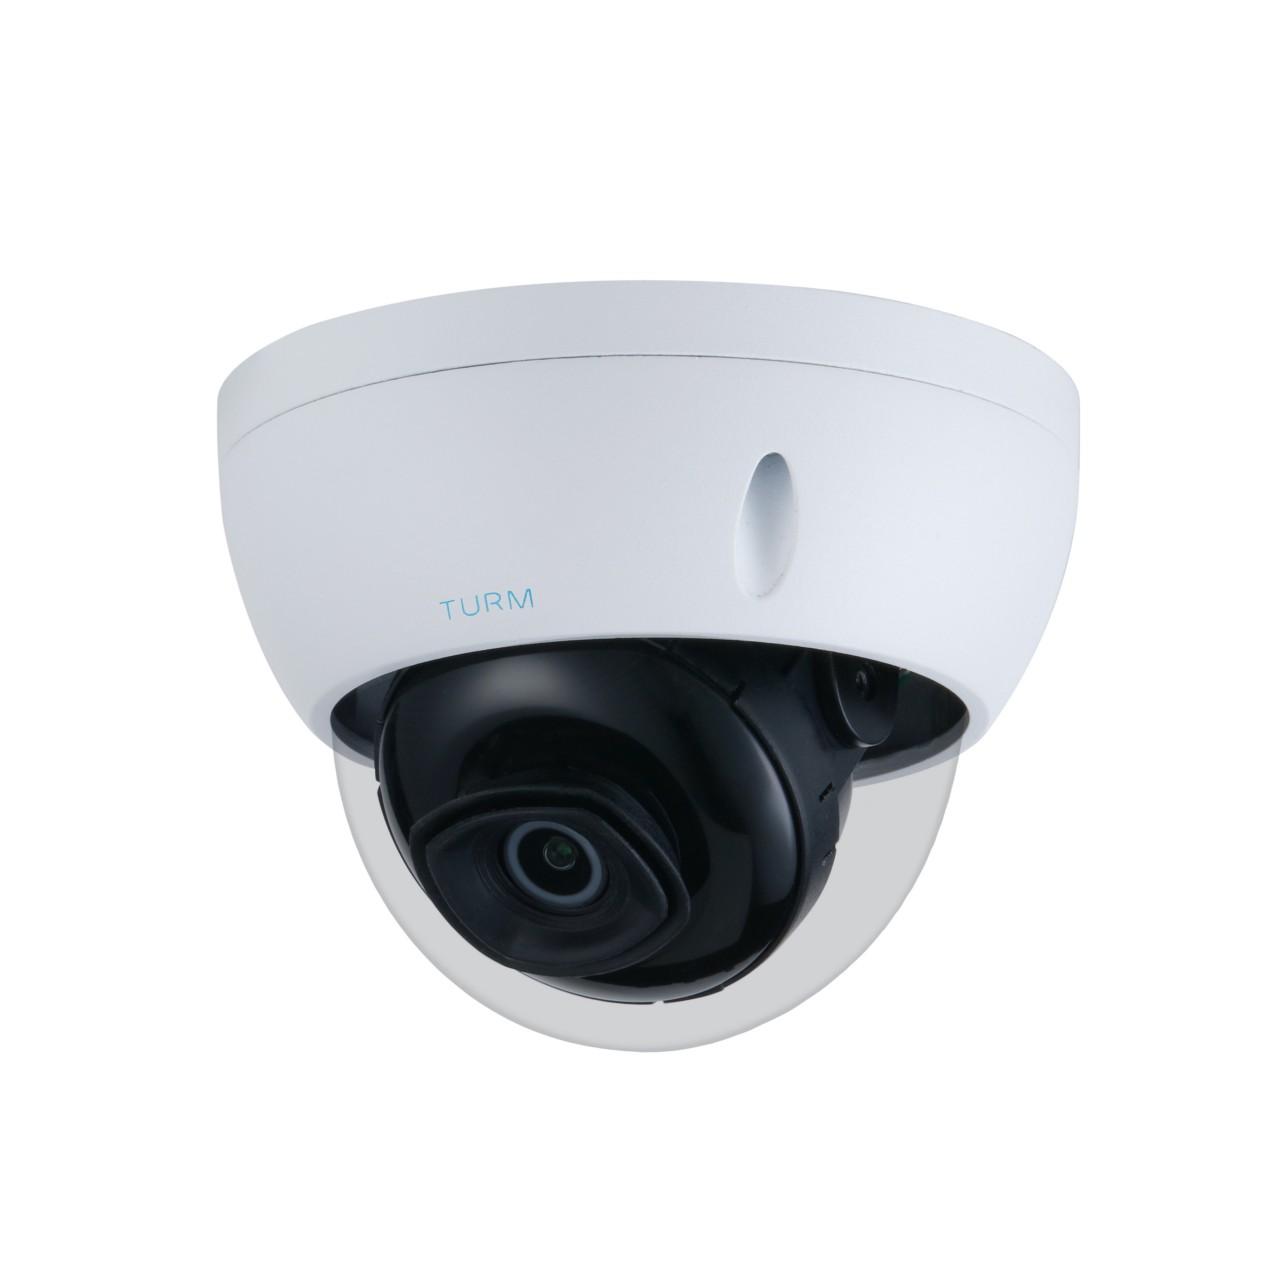 TURM IP Professional 8 MP Dome Kamera, 30m Nachtsicht mit Starlight, 2.8mm Objektiv, 105° Blickwinke